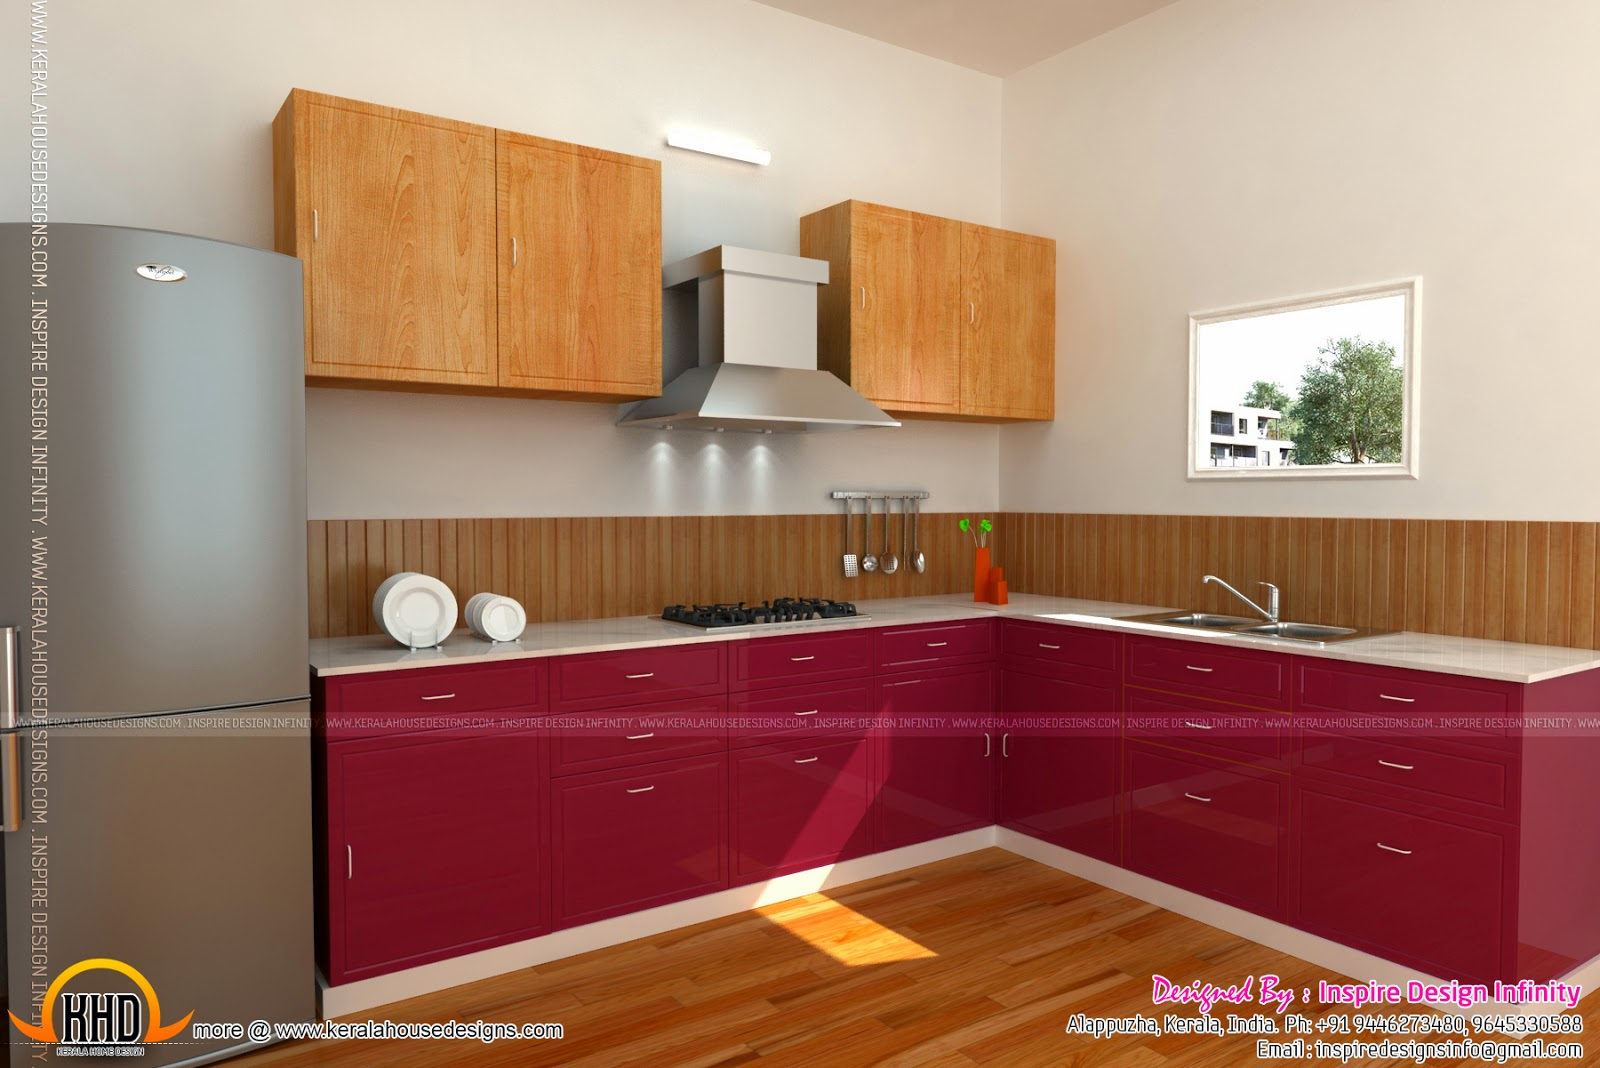 Infinity Kitchen Designs Traditional Indian Kitchen Designs Cristaleriaherreracom Interior